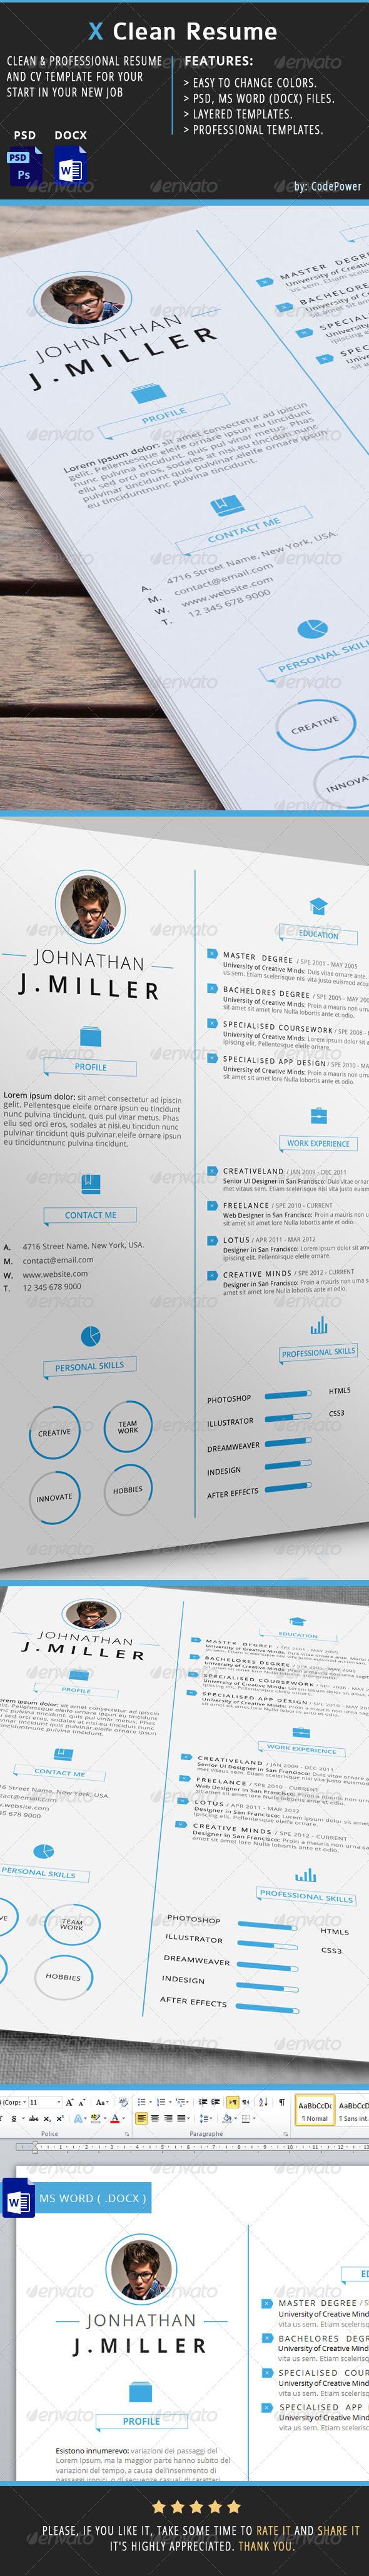 X Clean Resume by khaledzz9